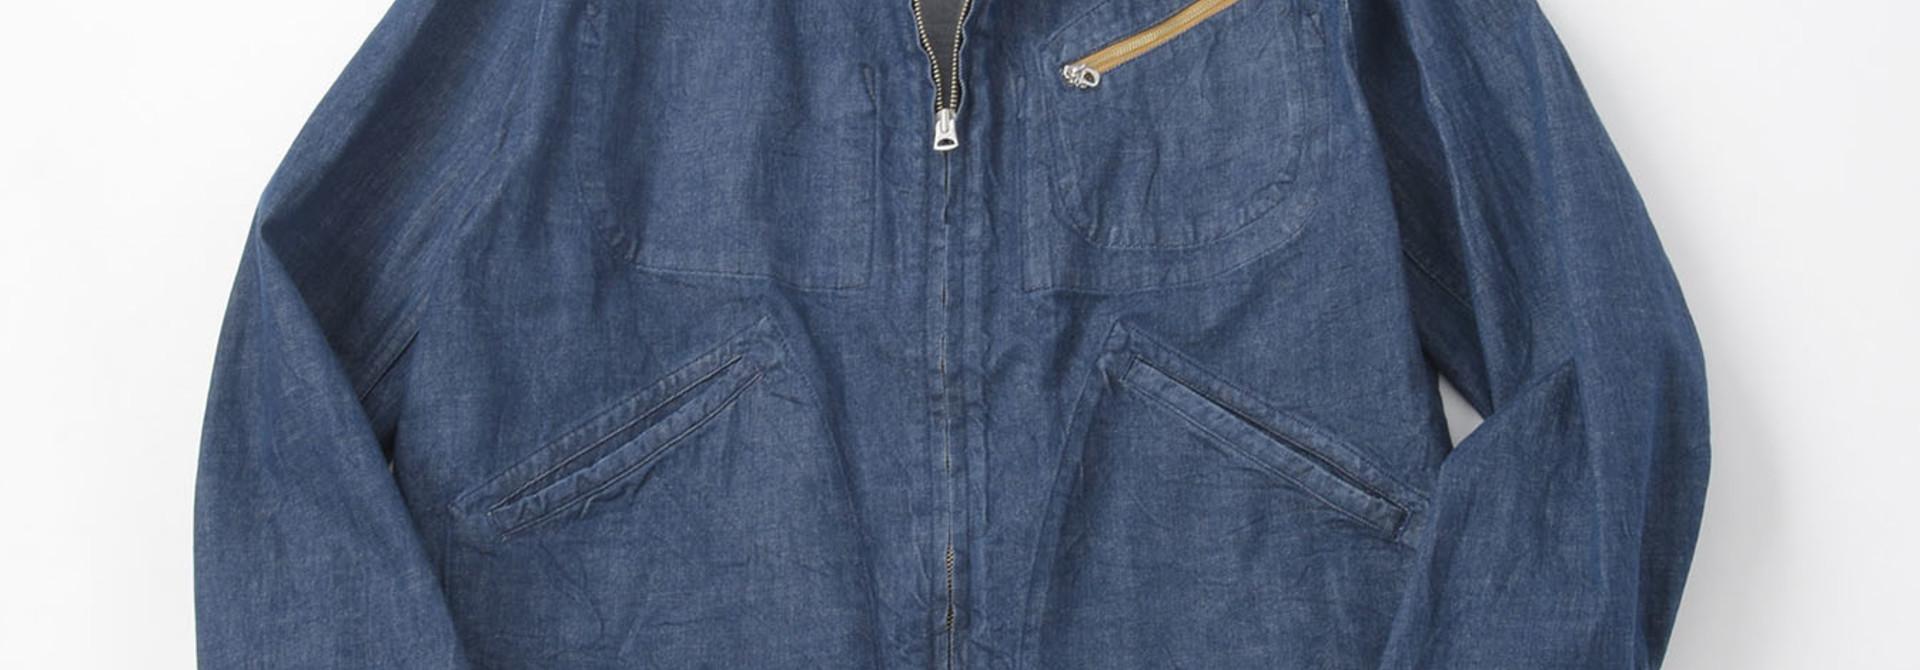 Distressed Mugi Denim Jacket